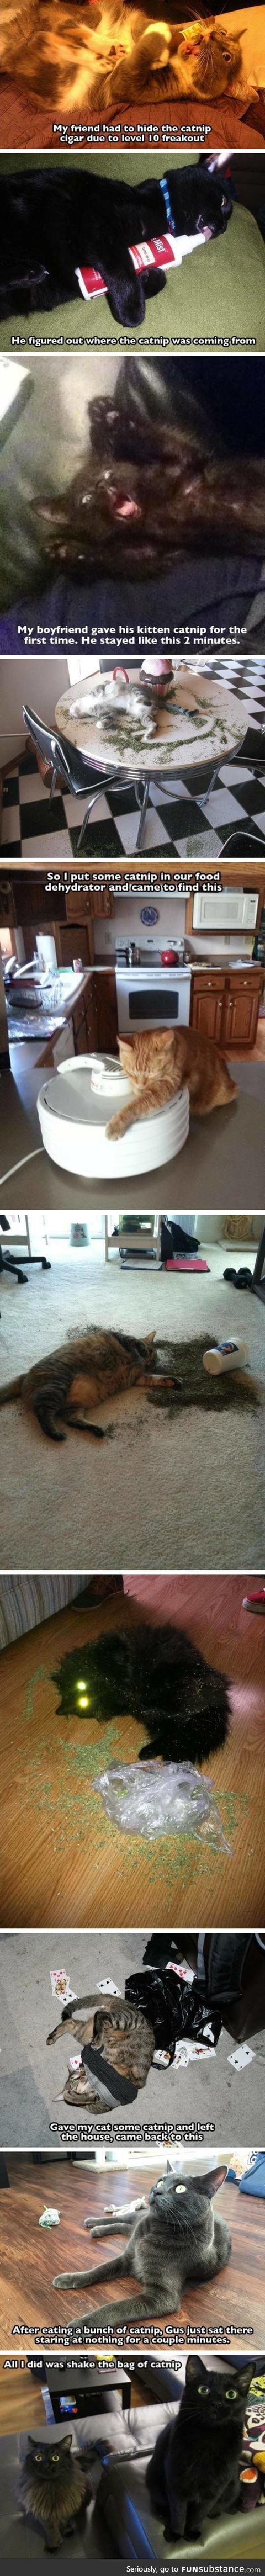 Don't Do Catnip, Kids